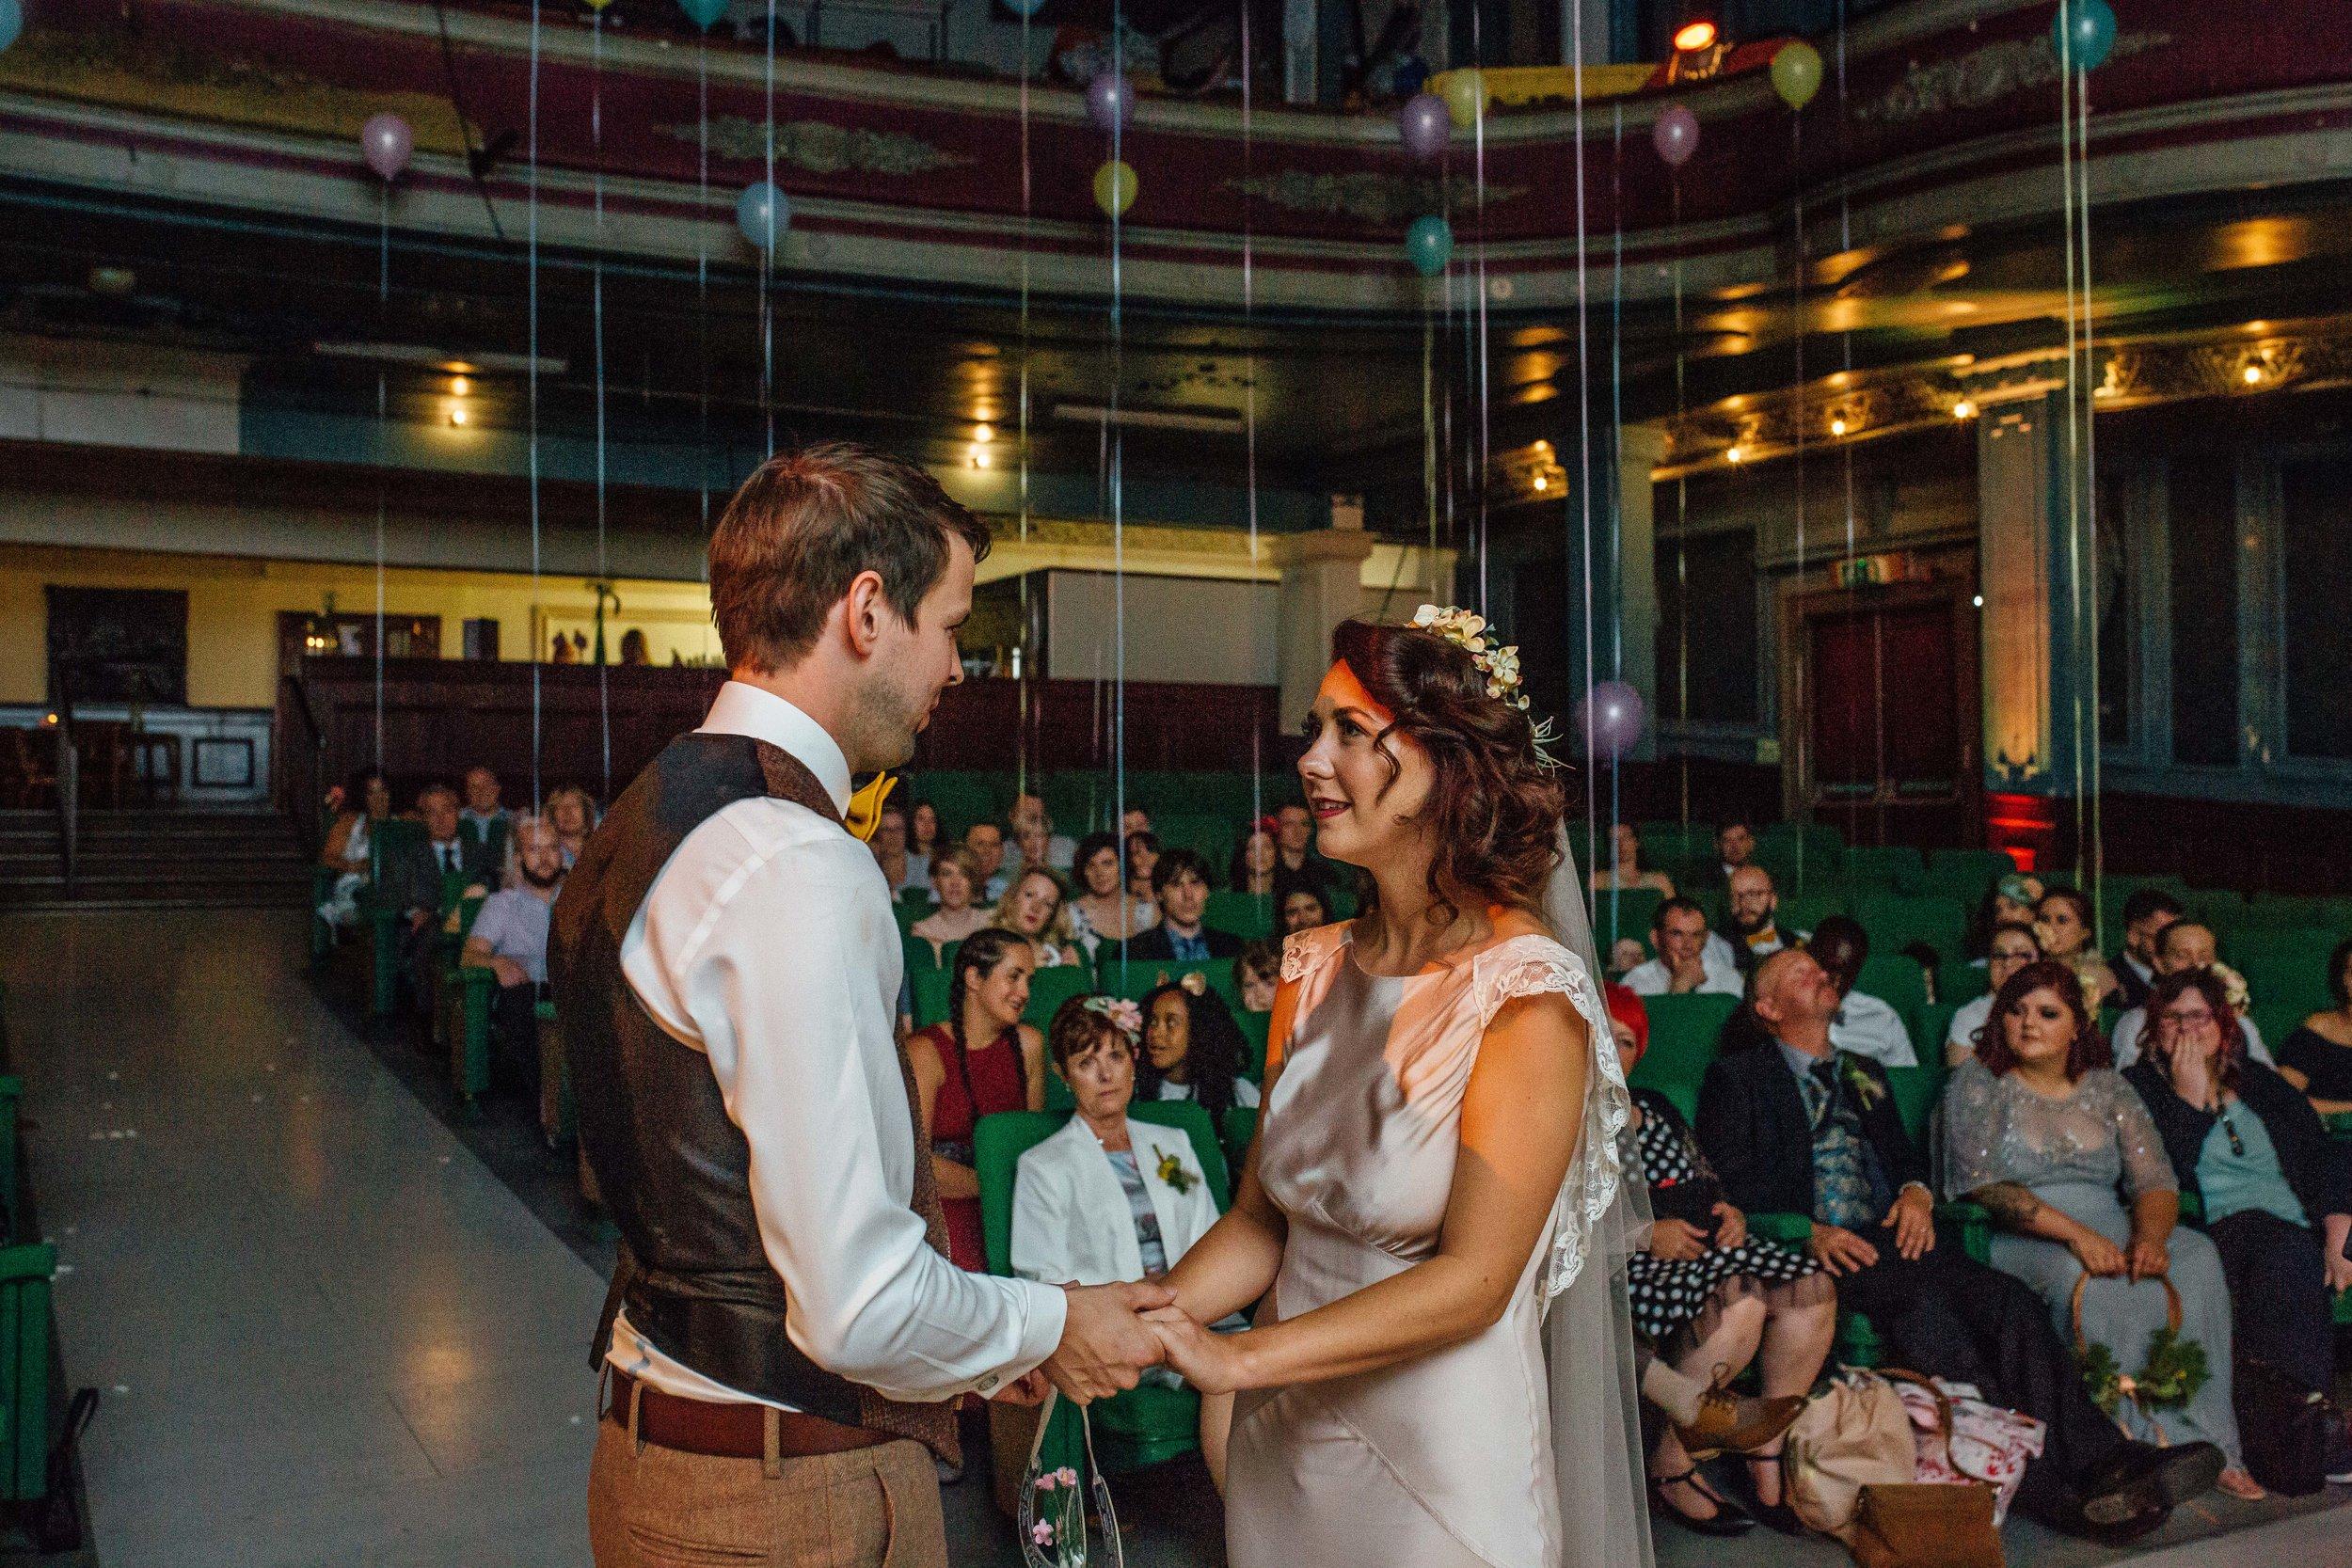 Katy-Bespoke-Veil-Sheffield-Wedding-Wes-Anderson-Susanna-Greening-Derbyshire-14